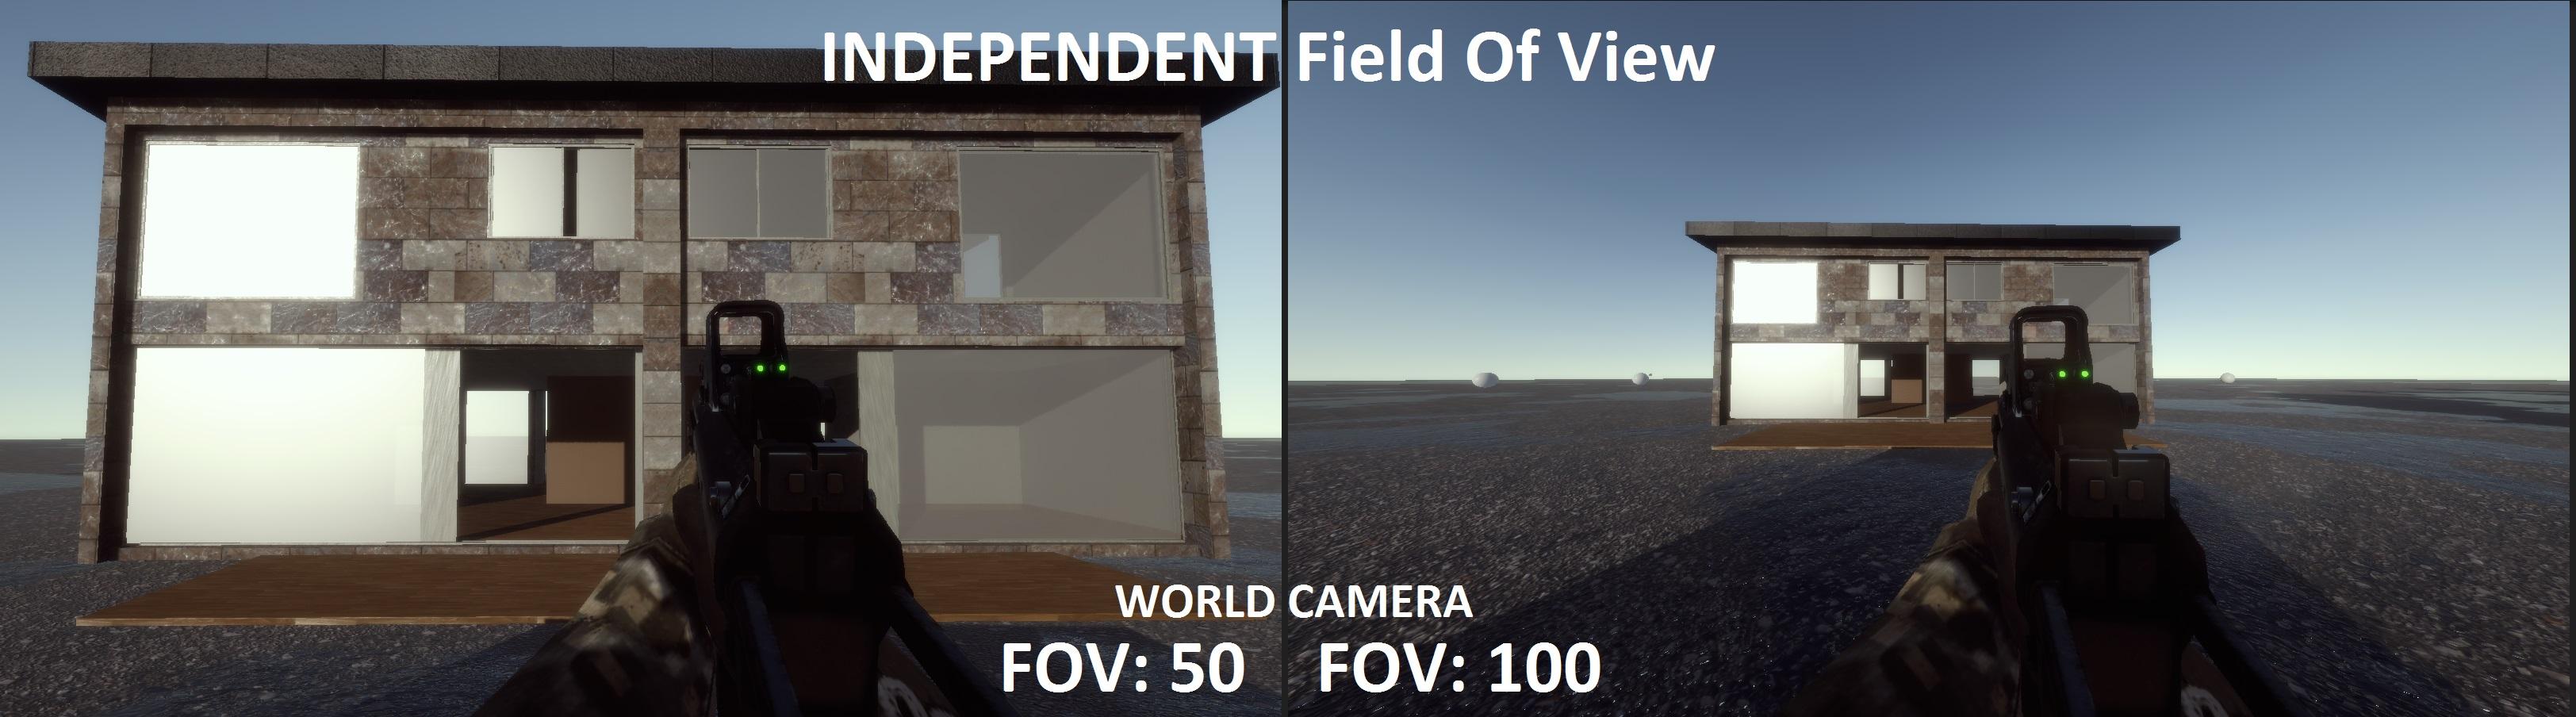 FirstPersonView_environmentFOV.jpg